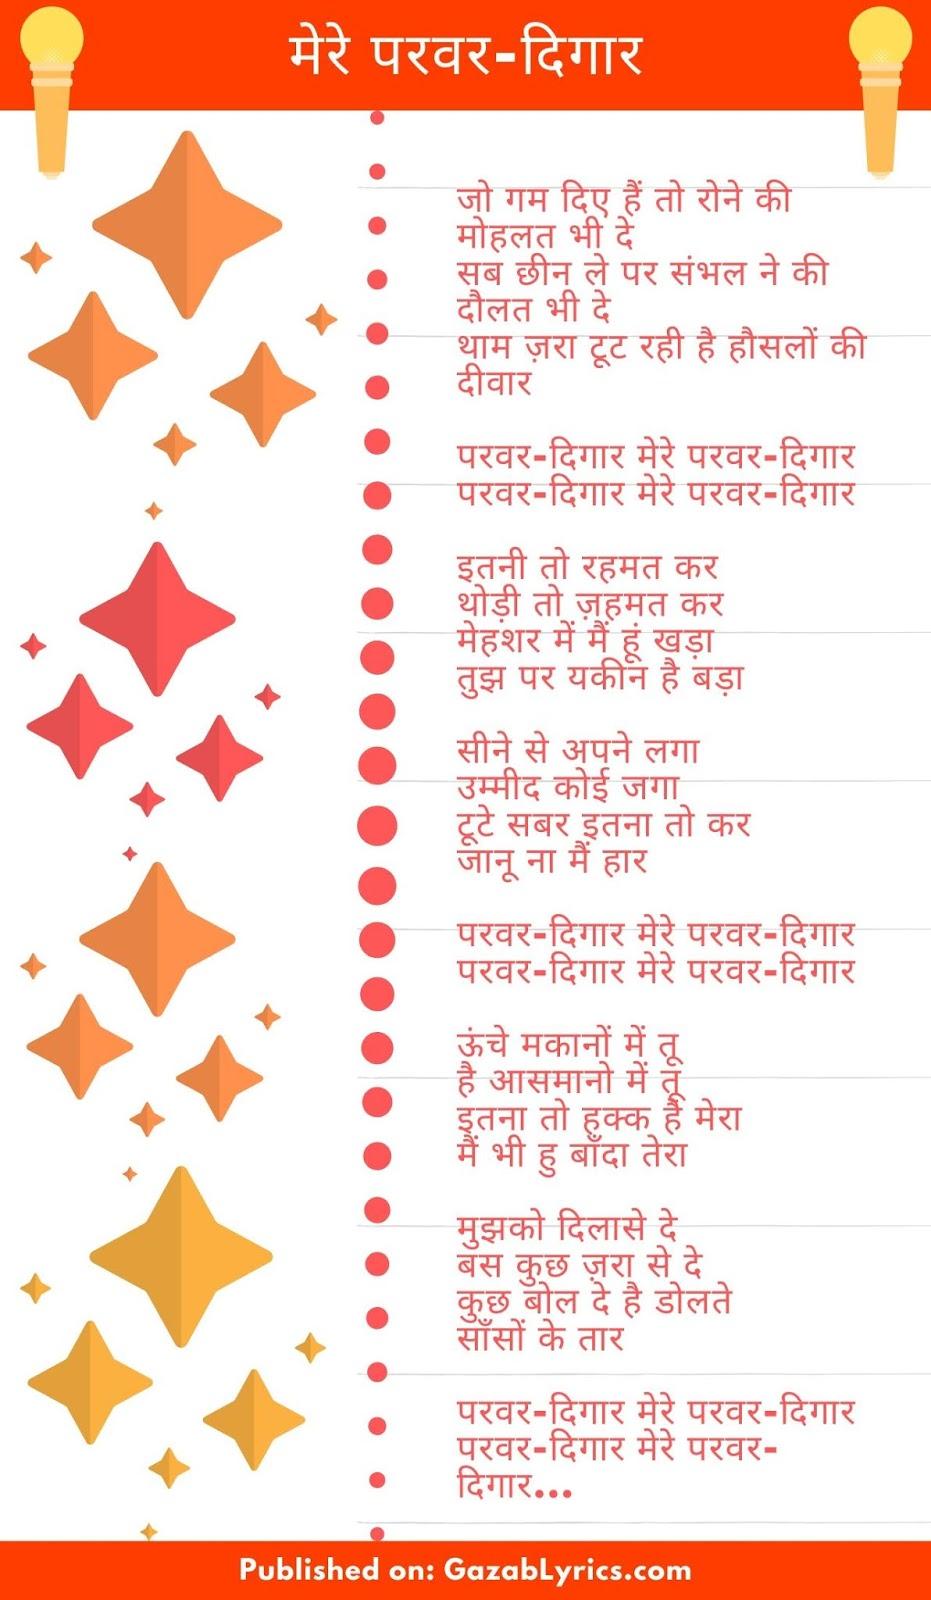 Mere Parwardigaar song lyrics image